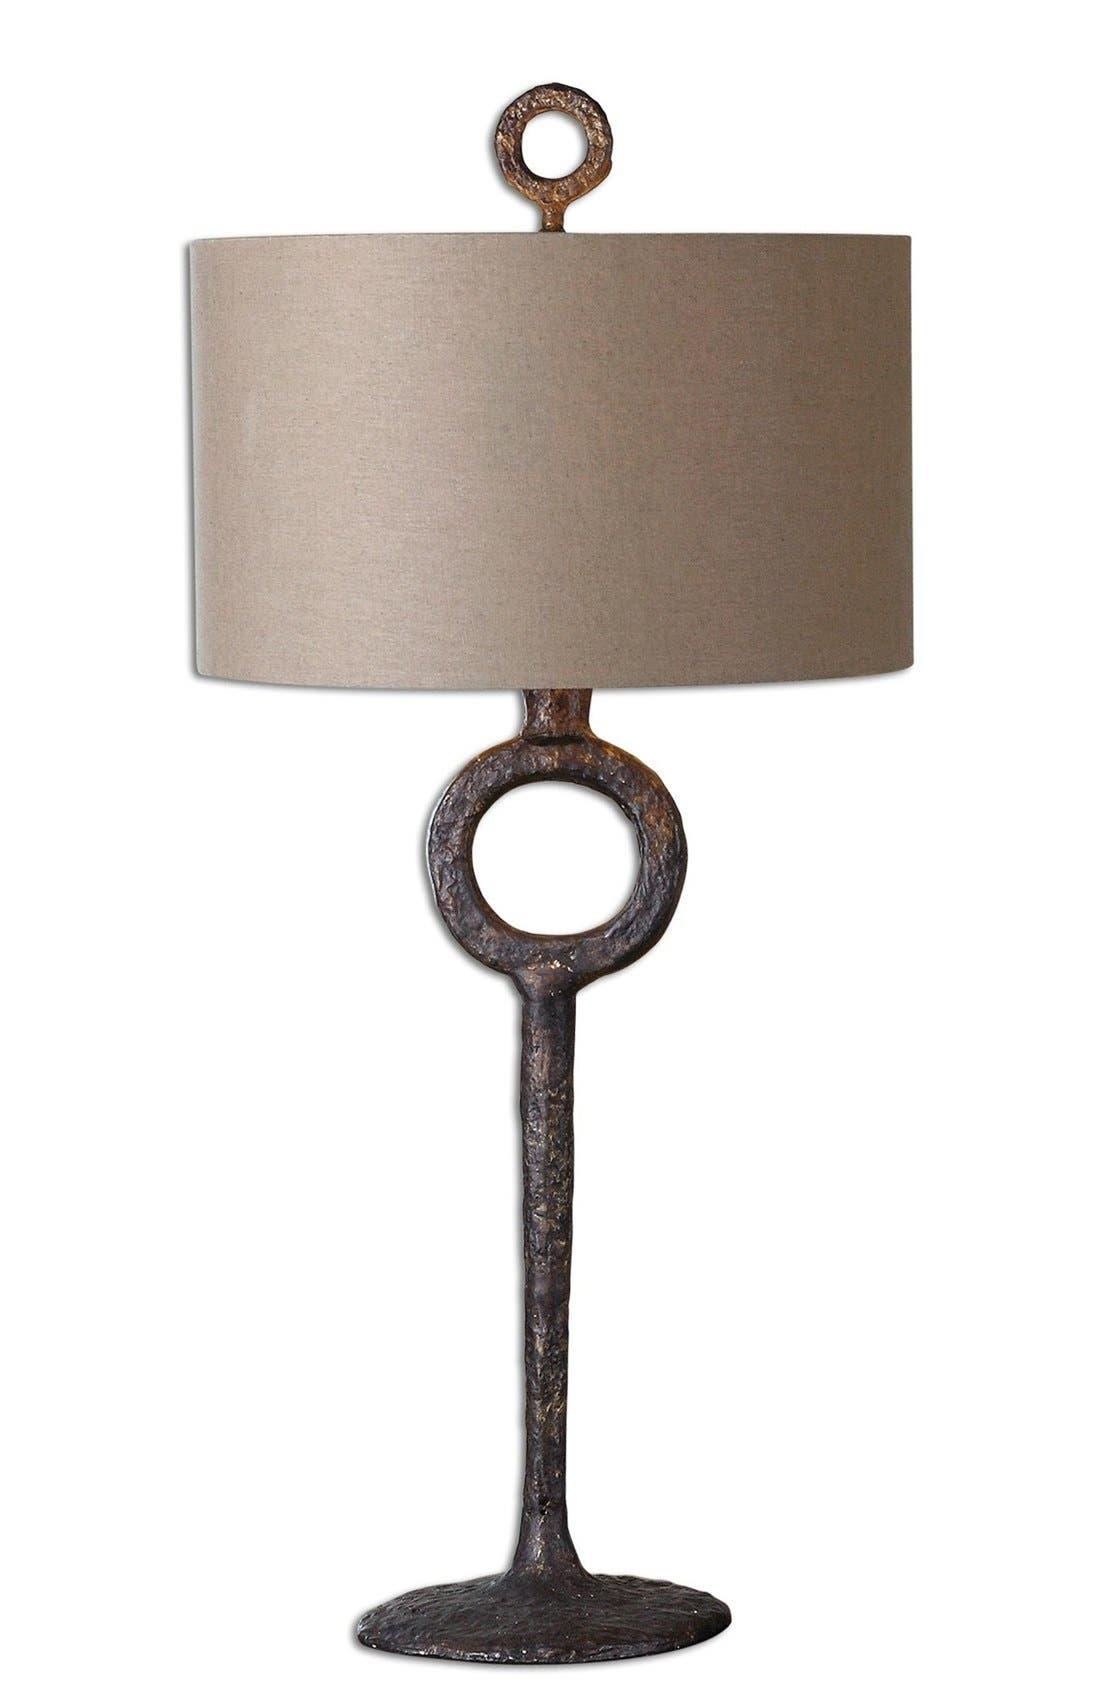 Main Image - Uttermost 'Ferro' Cast Iron Table Lamp